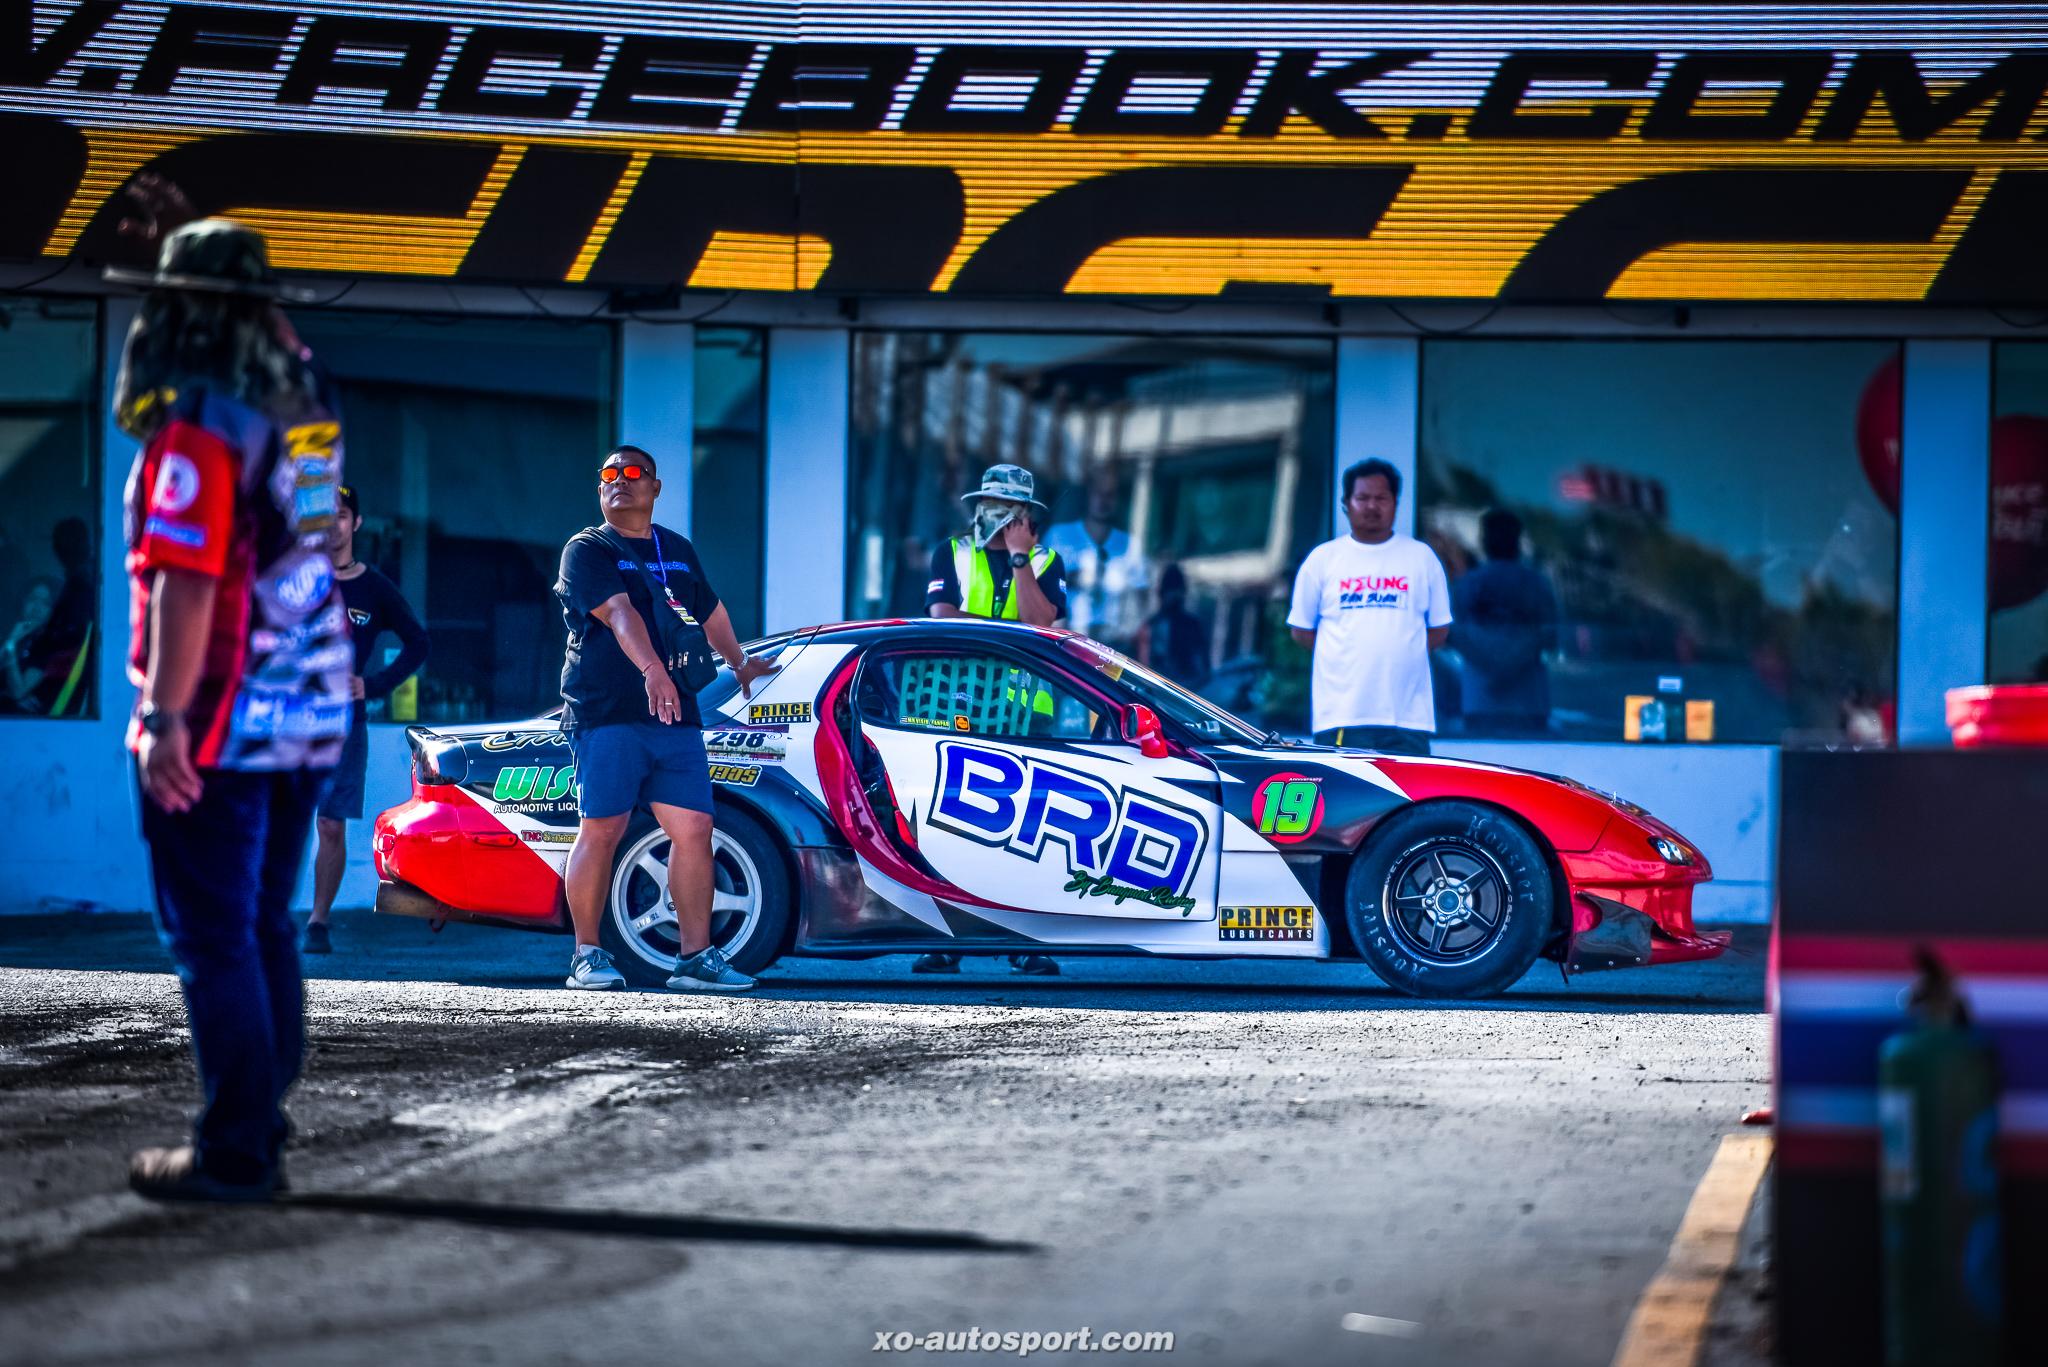 Bangmod Racing Super 4 2WD 12